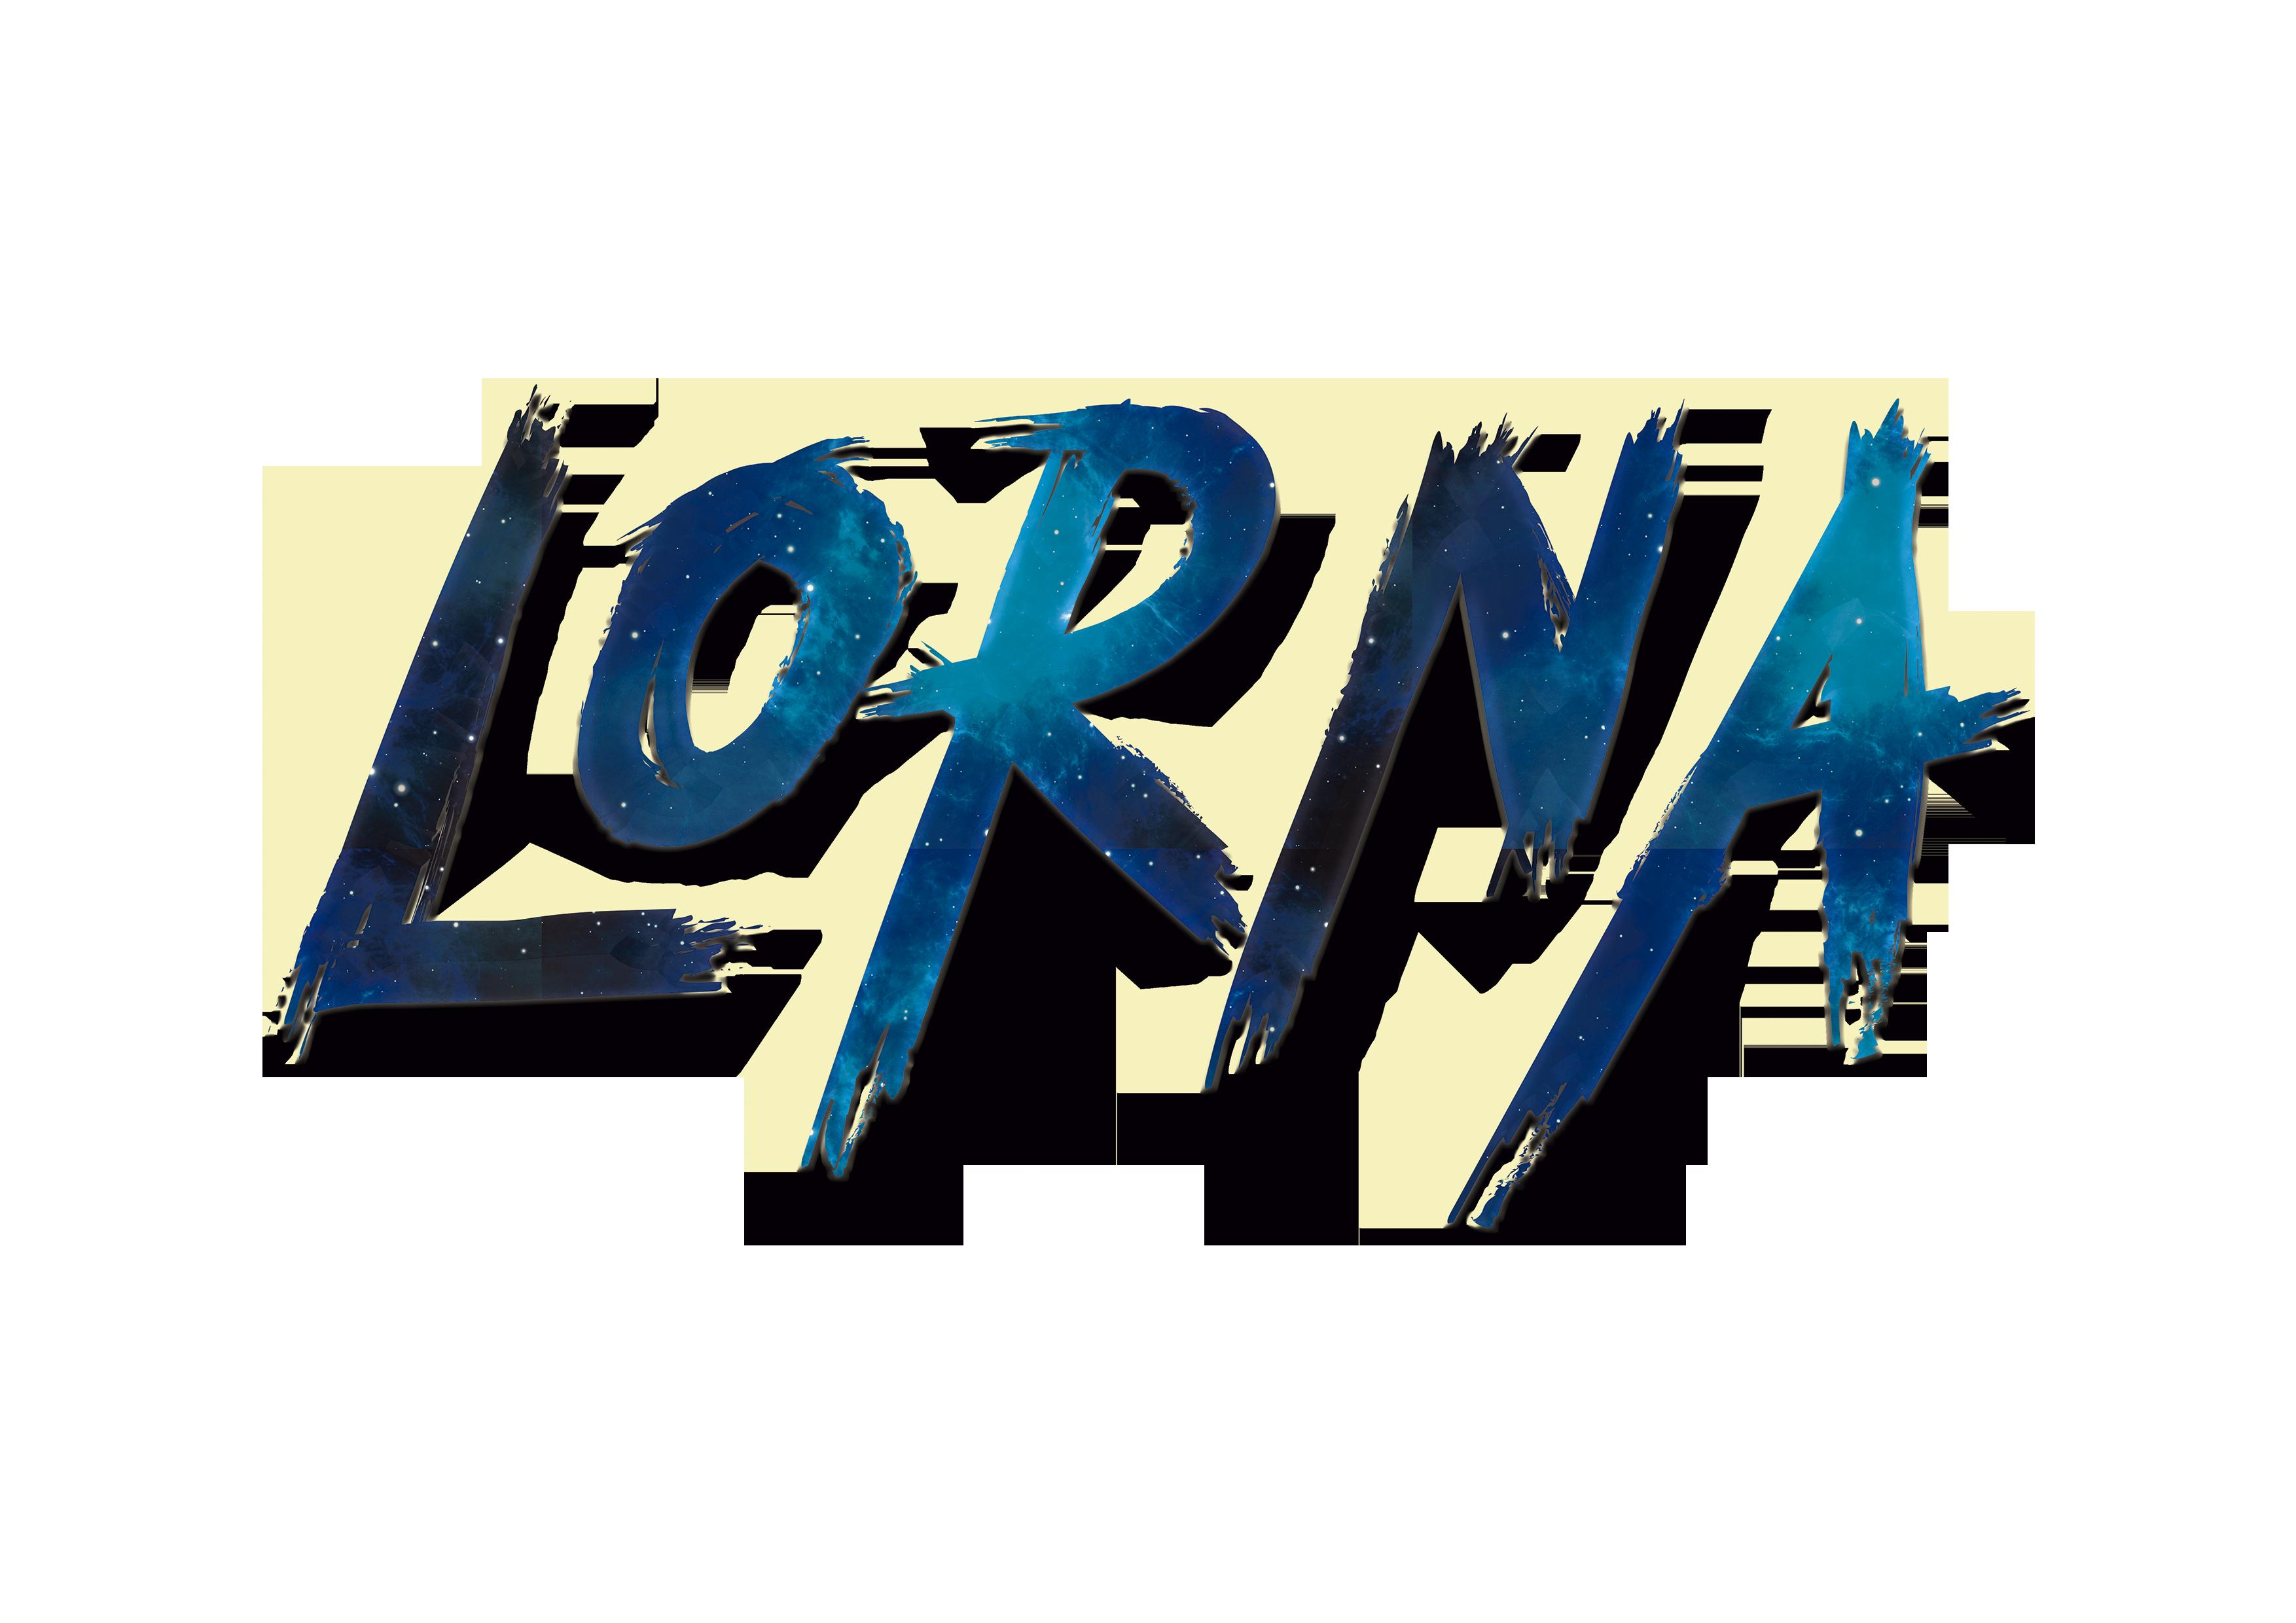 Lorna - Artista Urbana